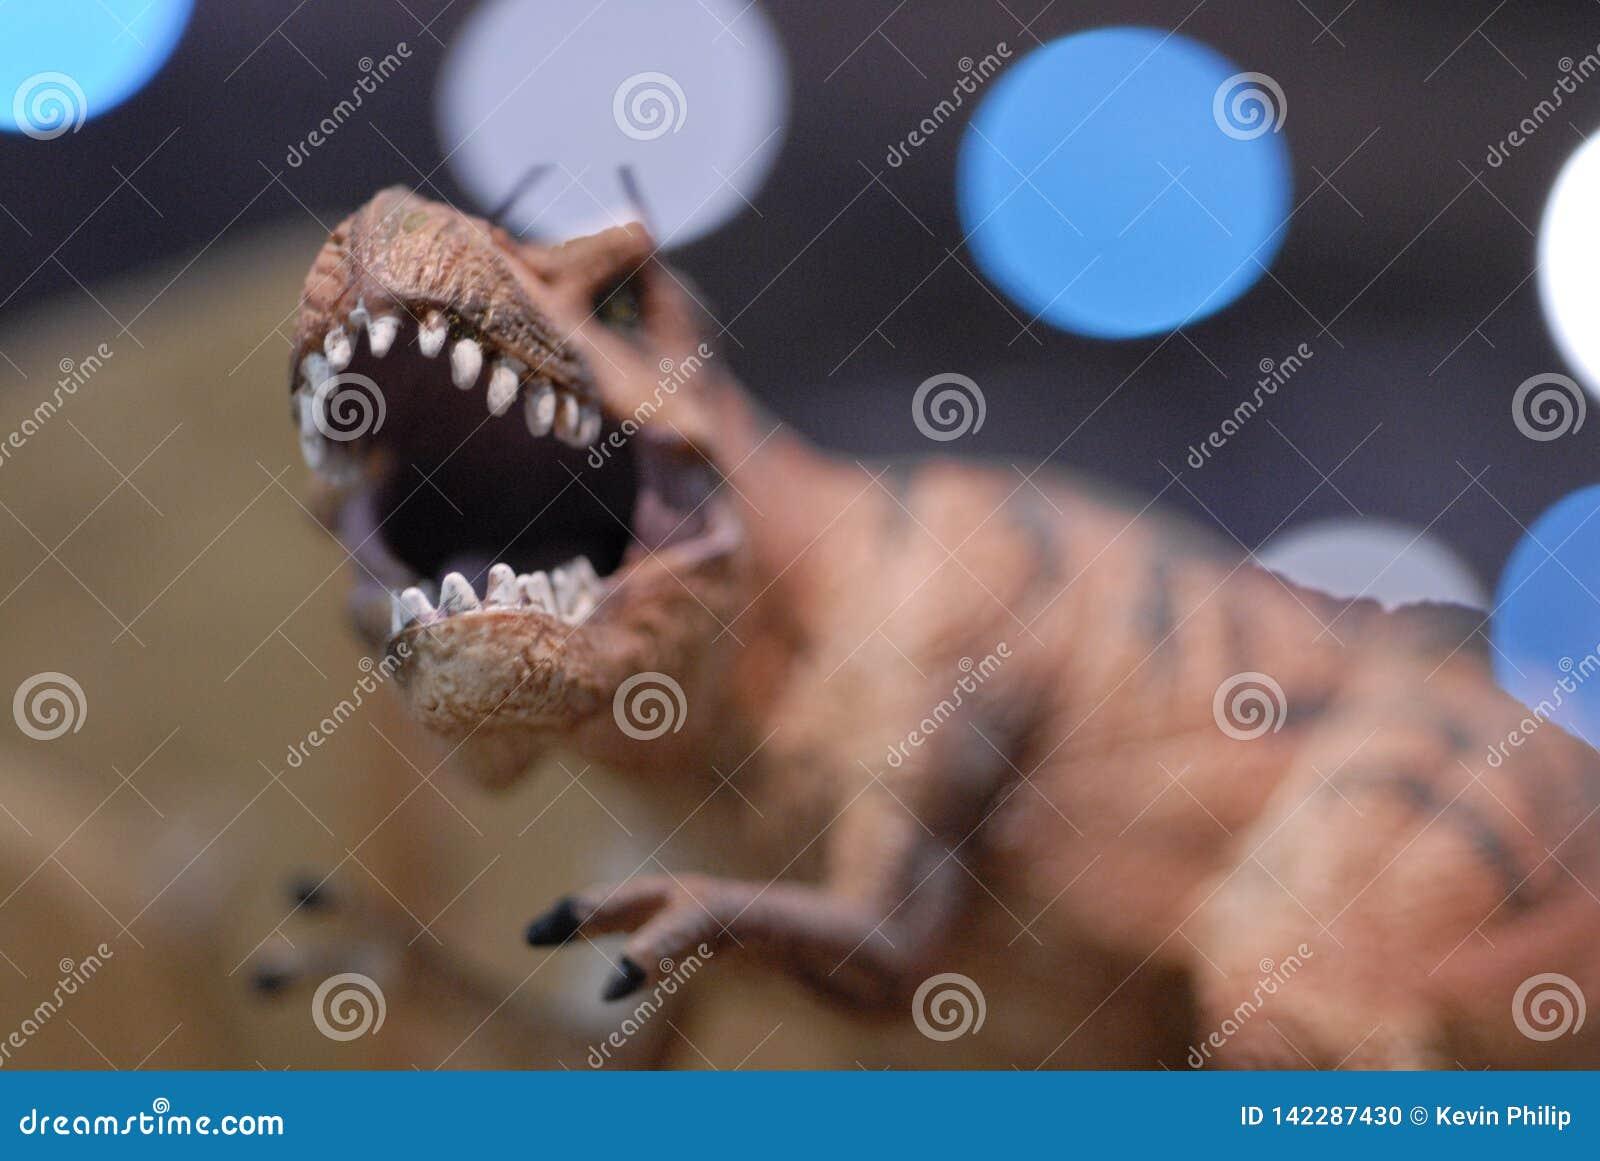 Close Up Dinosaur Sculpture Stock Photo - Image of teeth